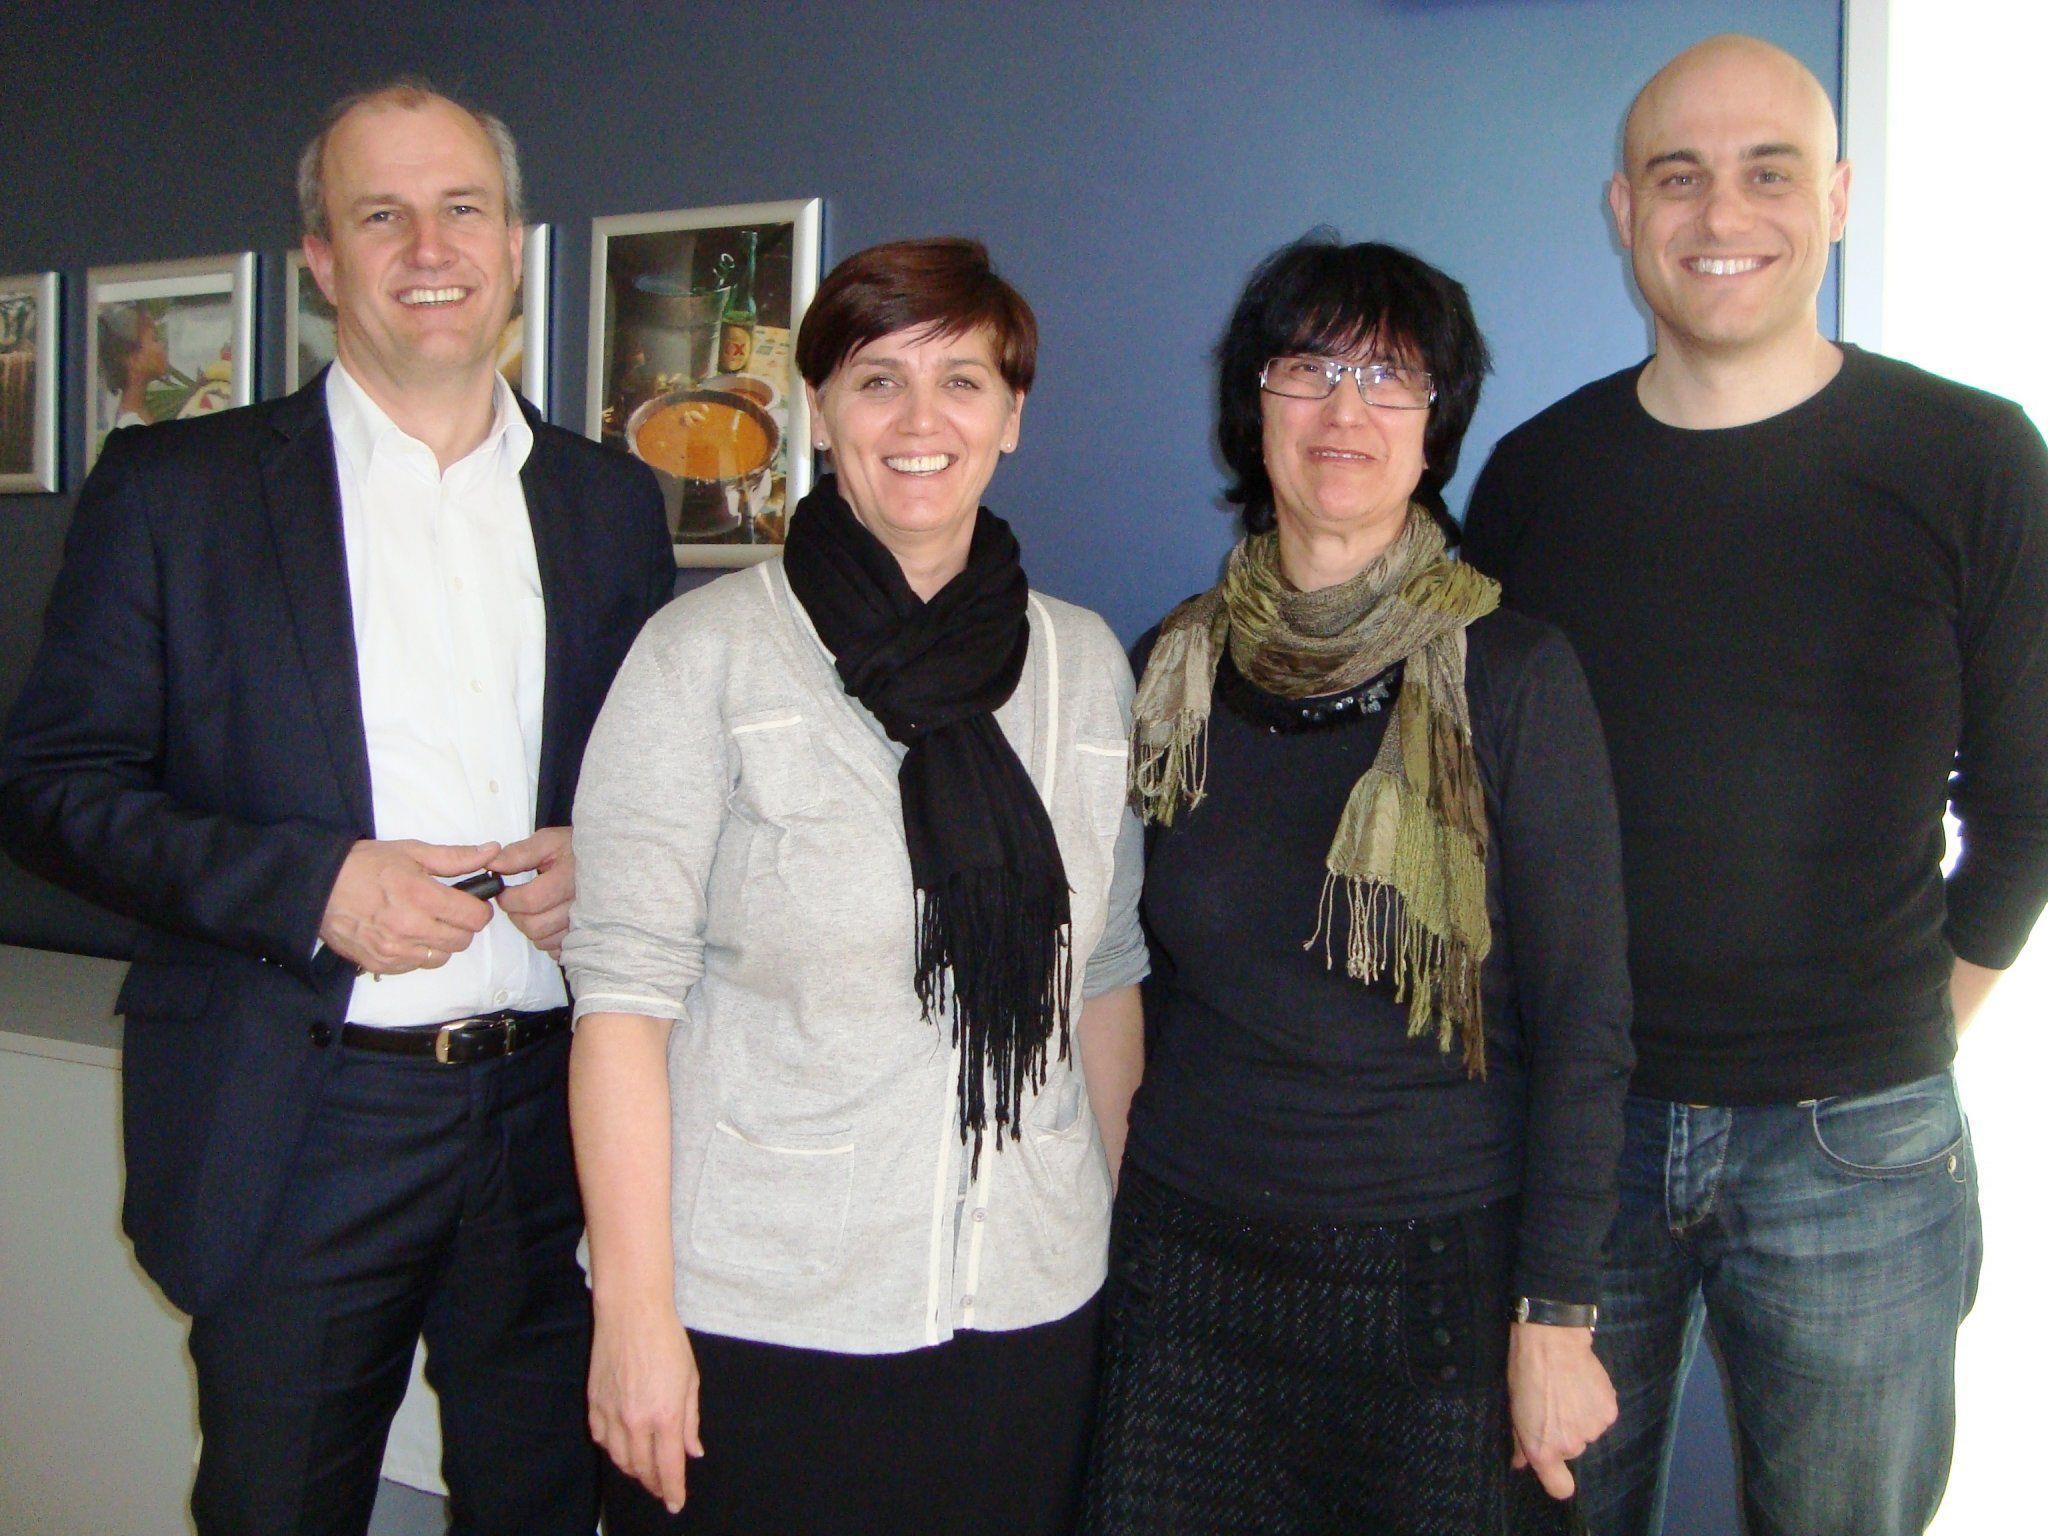 Direktor Andreas Kappaurer, Andrea Huber, Kathi Kappaurer und Klaus Gmeiner